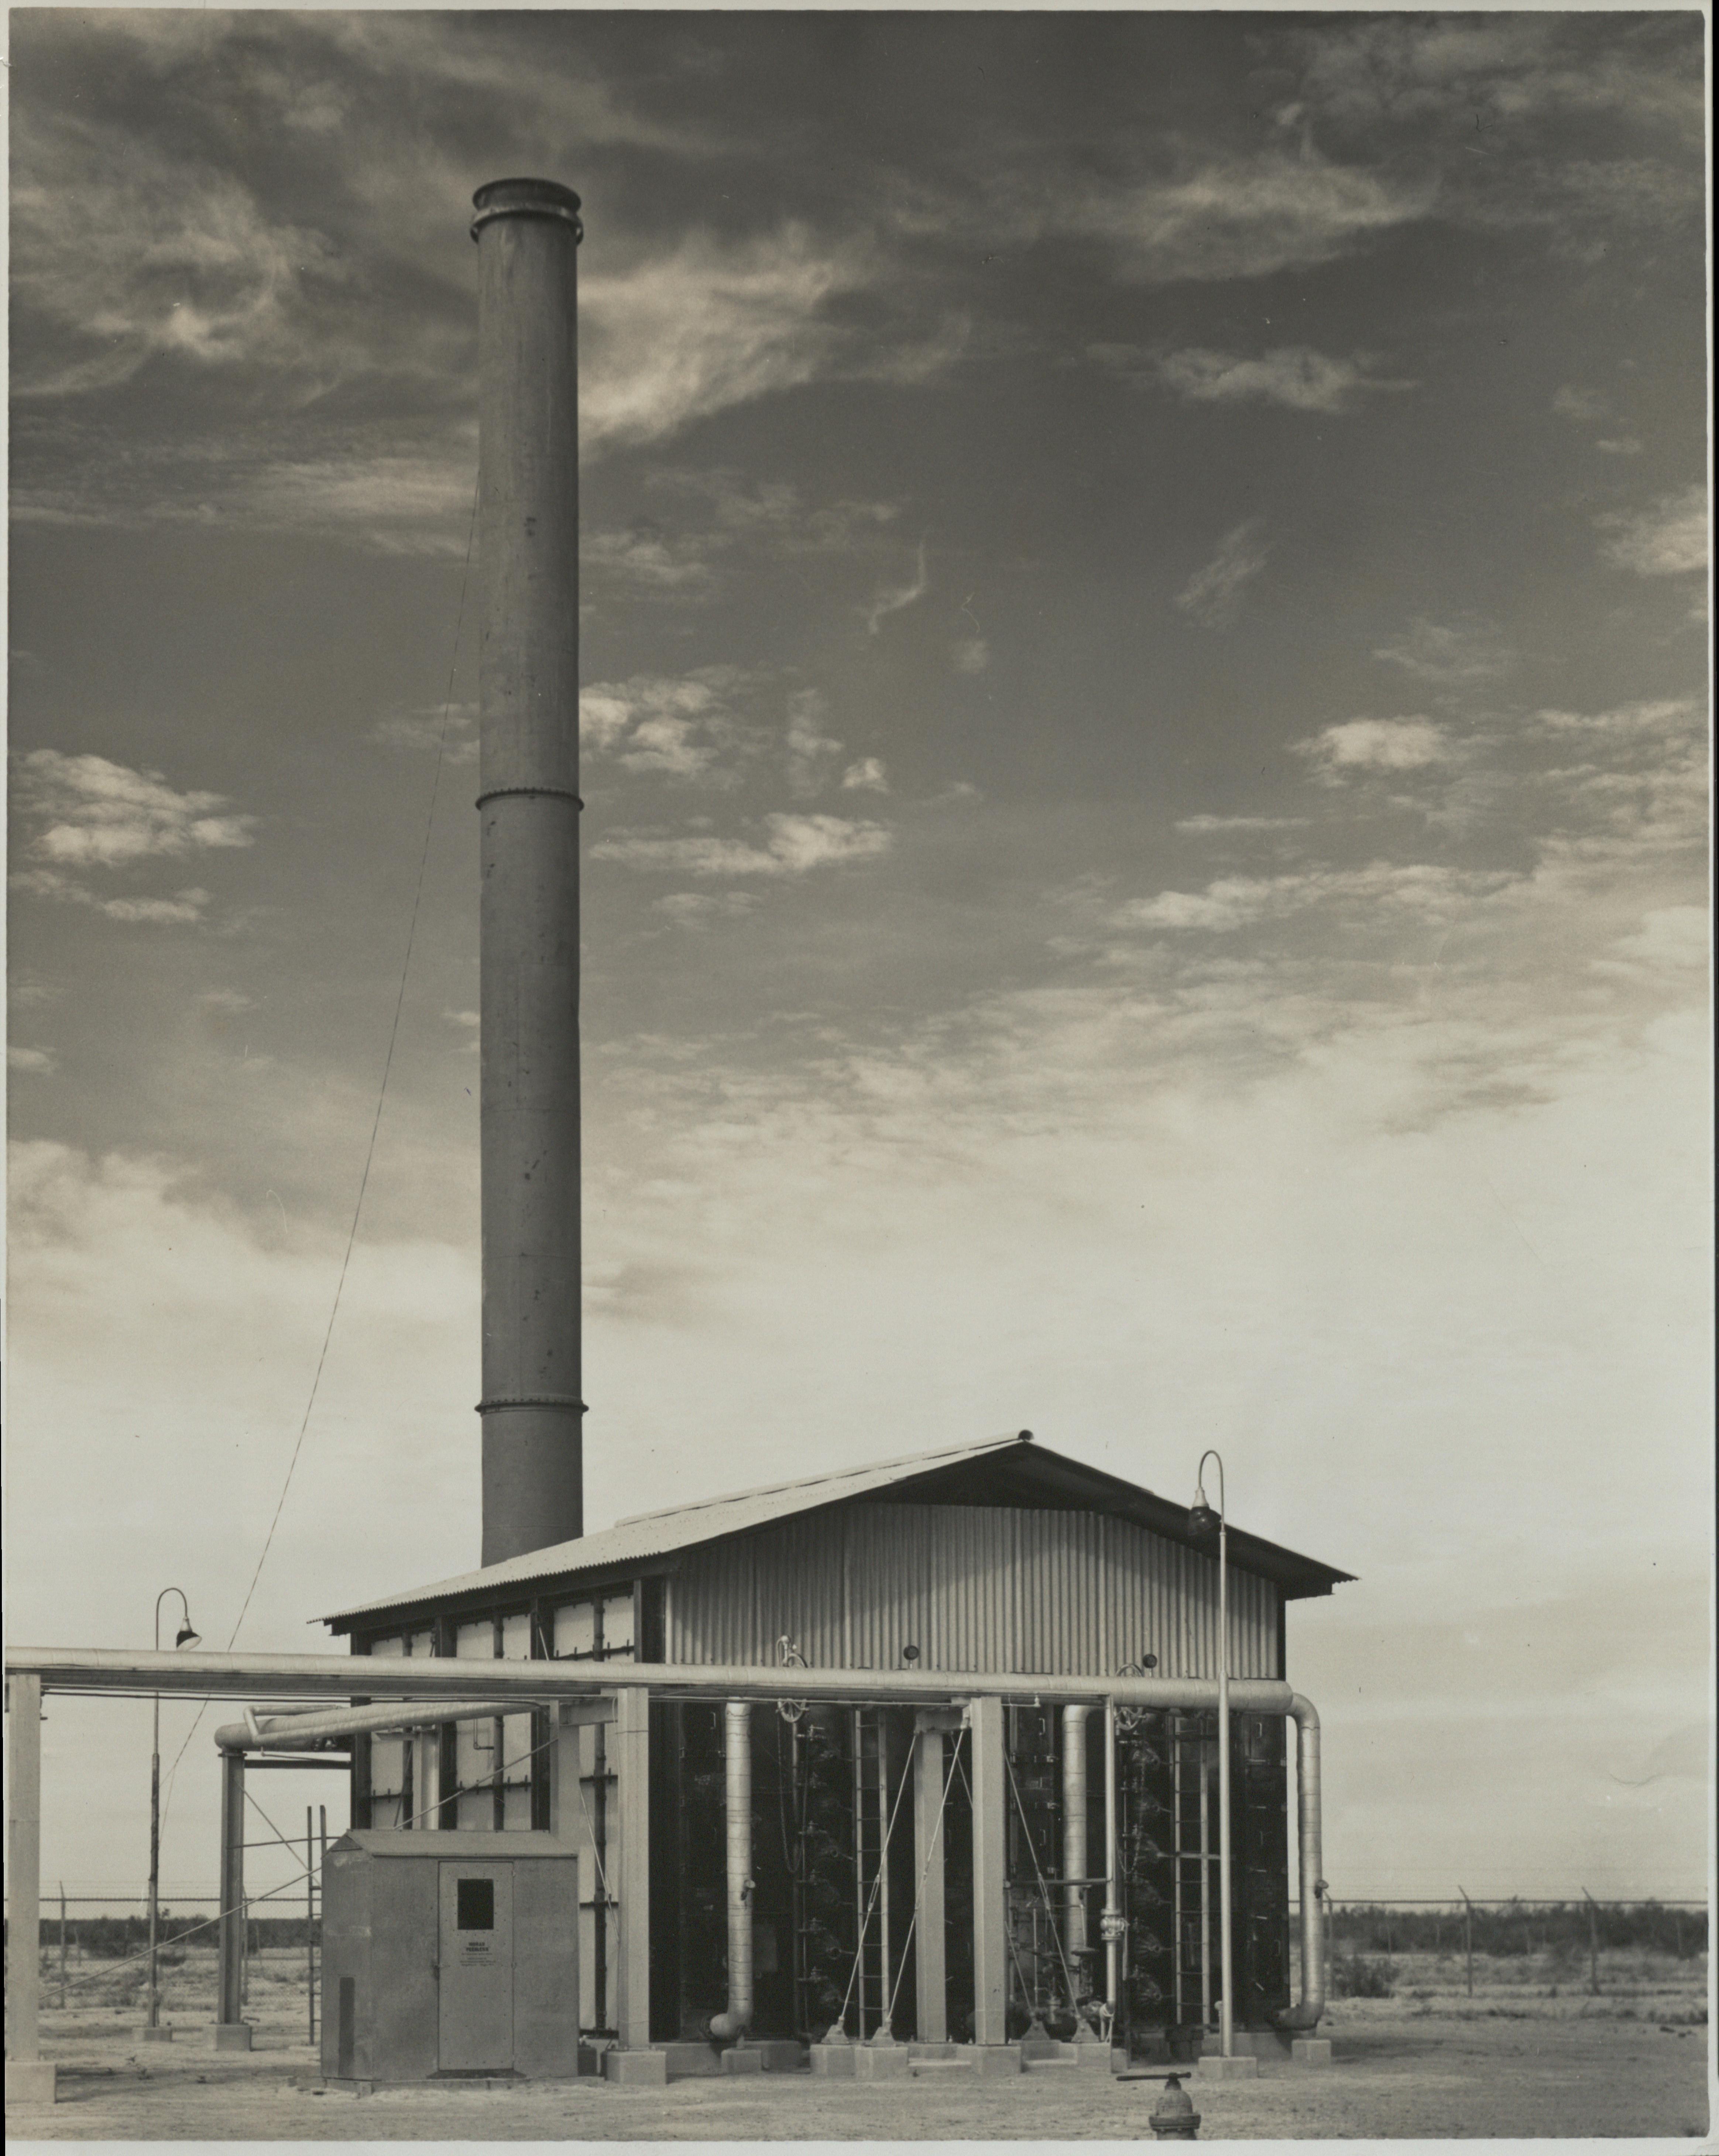 Texas Natural Gasoline Company Furnace (AC604-A04-001)